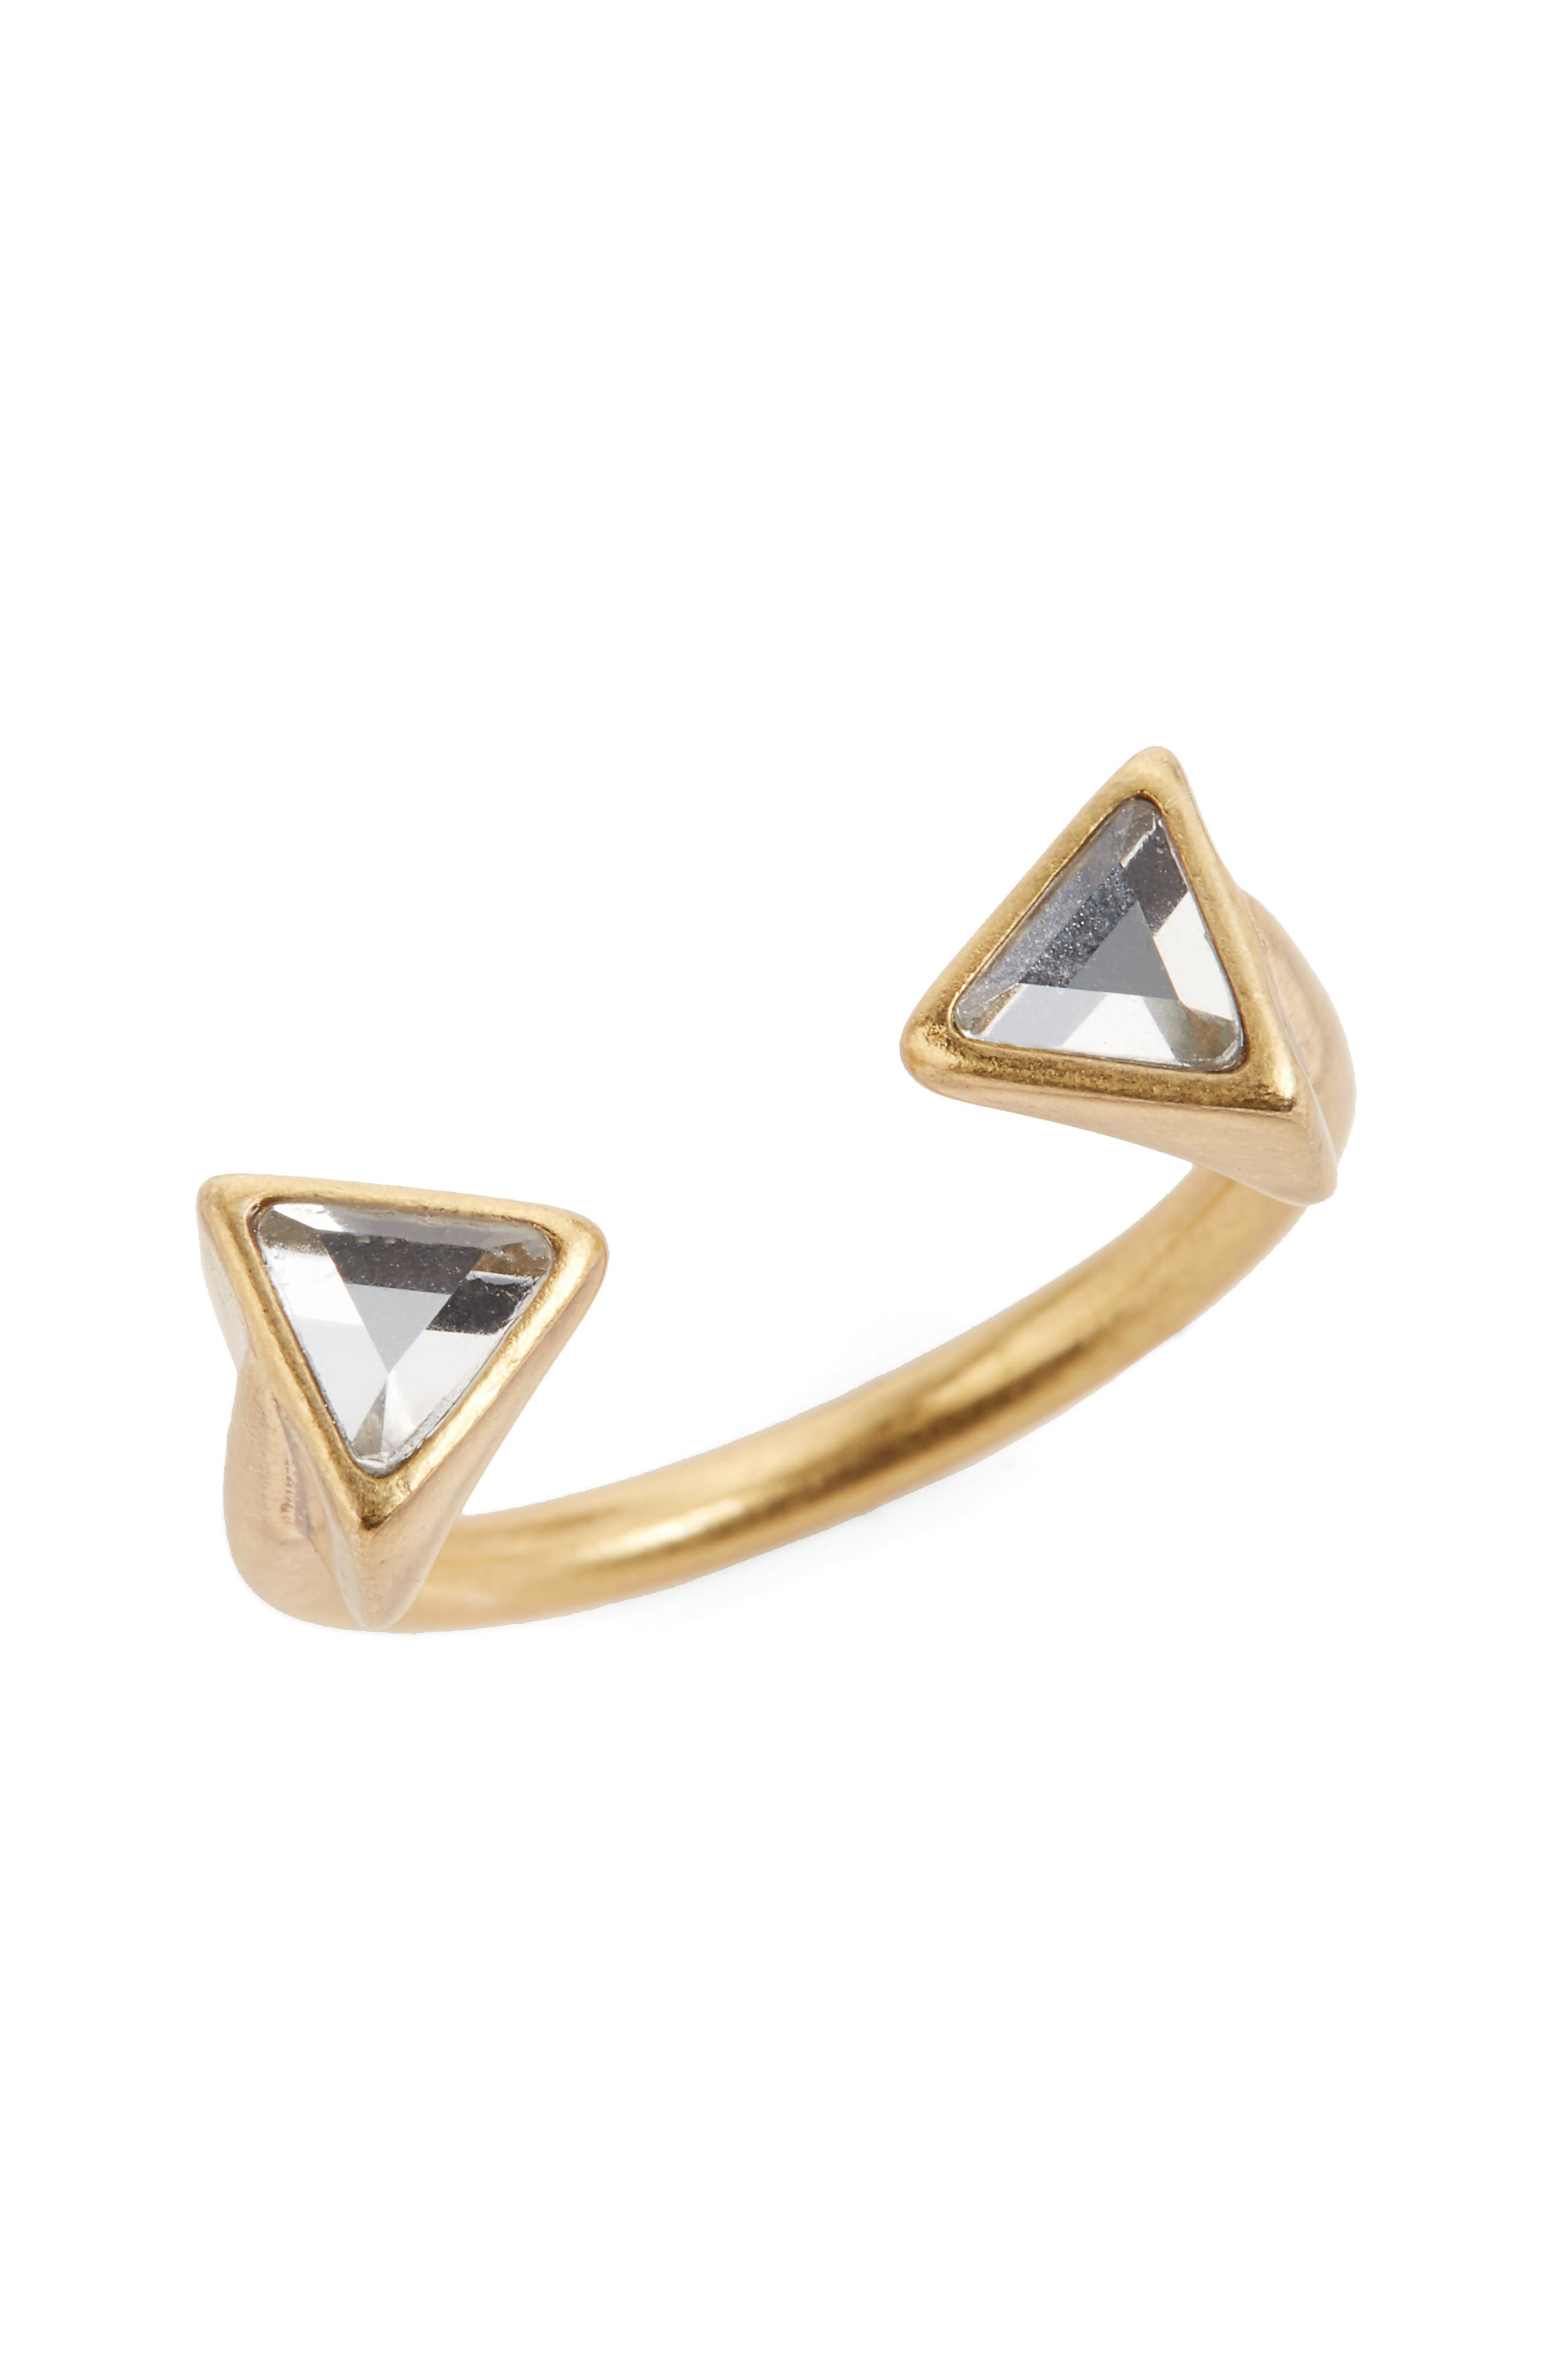 Main Image - Madewell Crystal Ball Ring